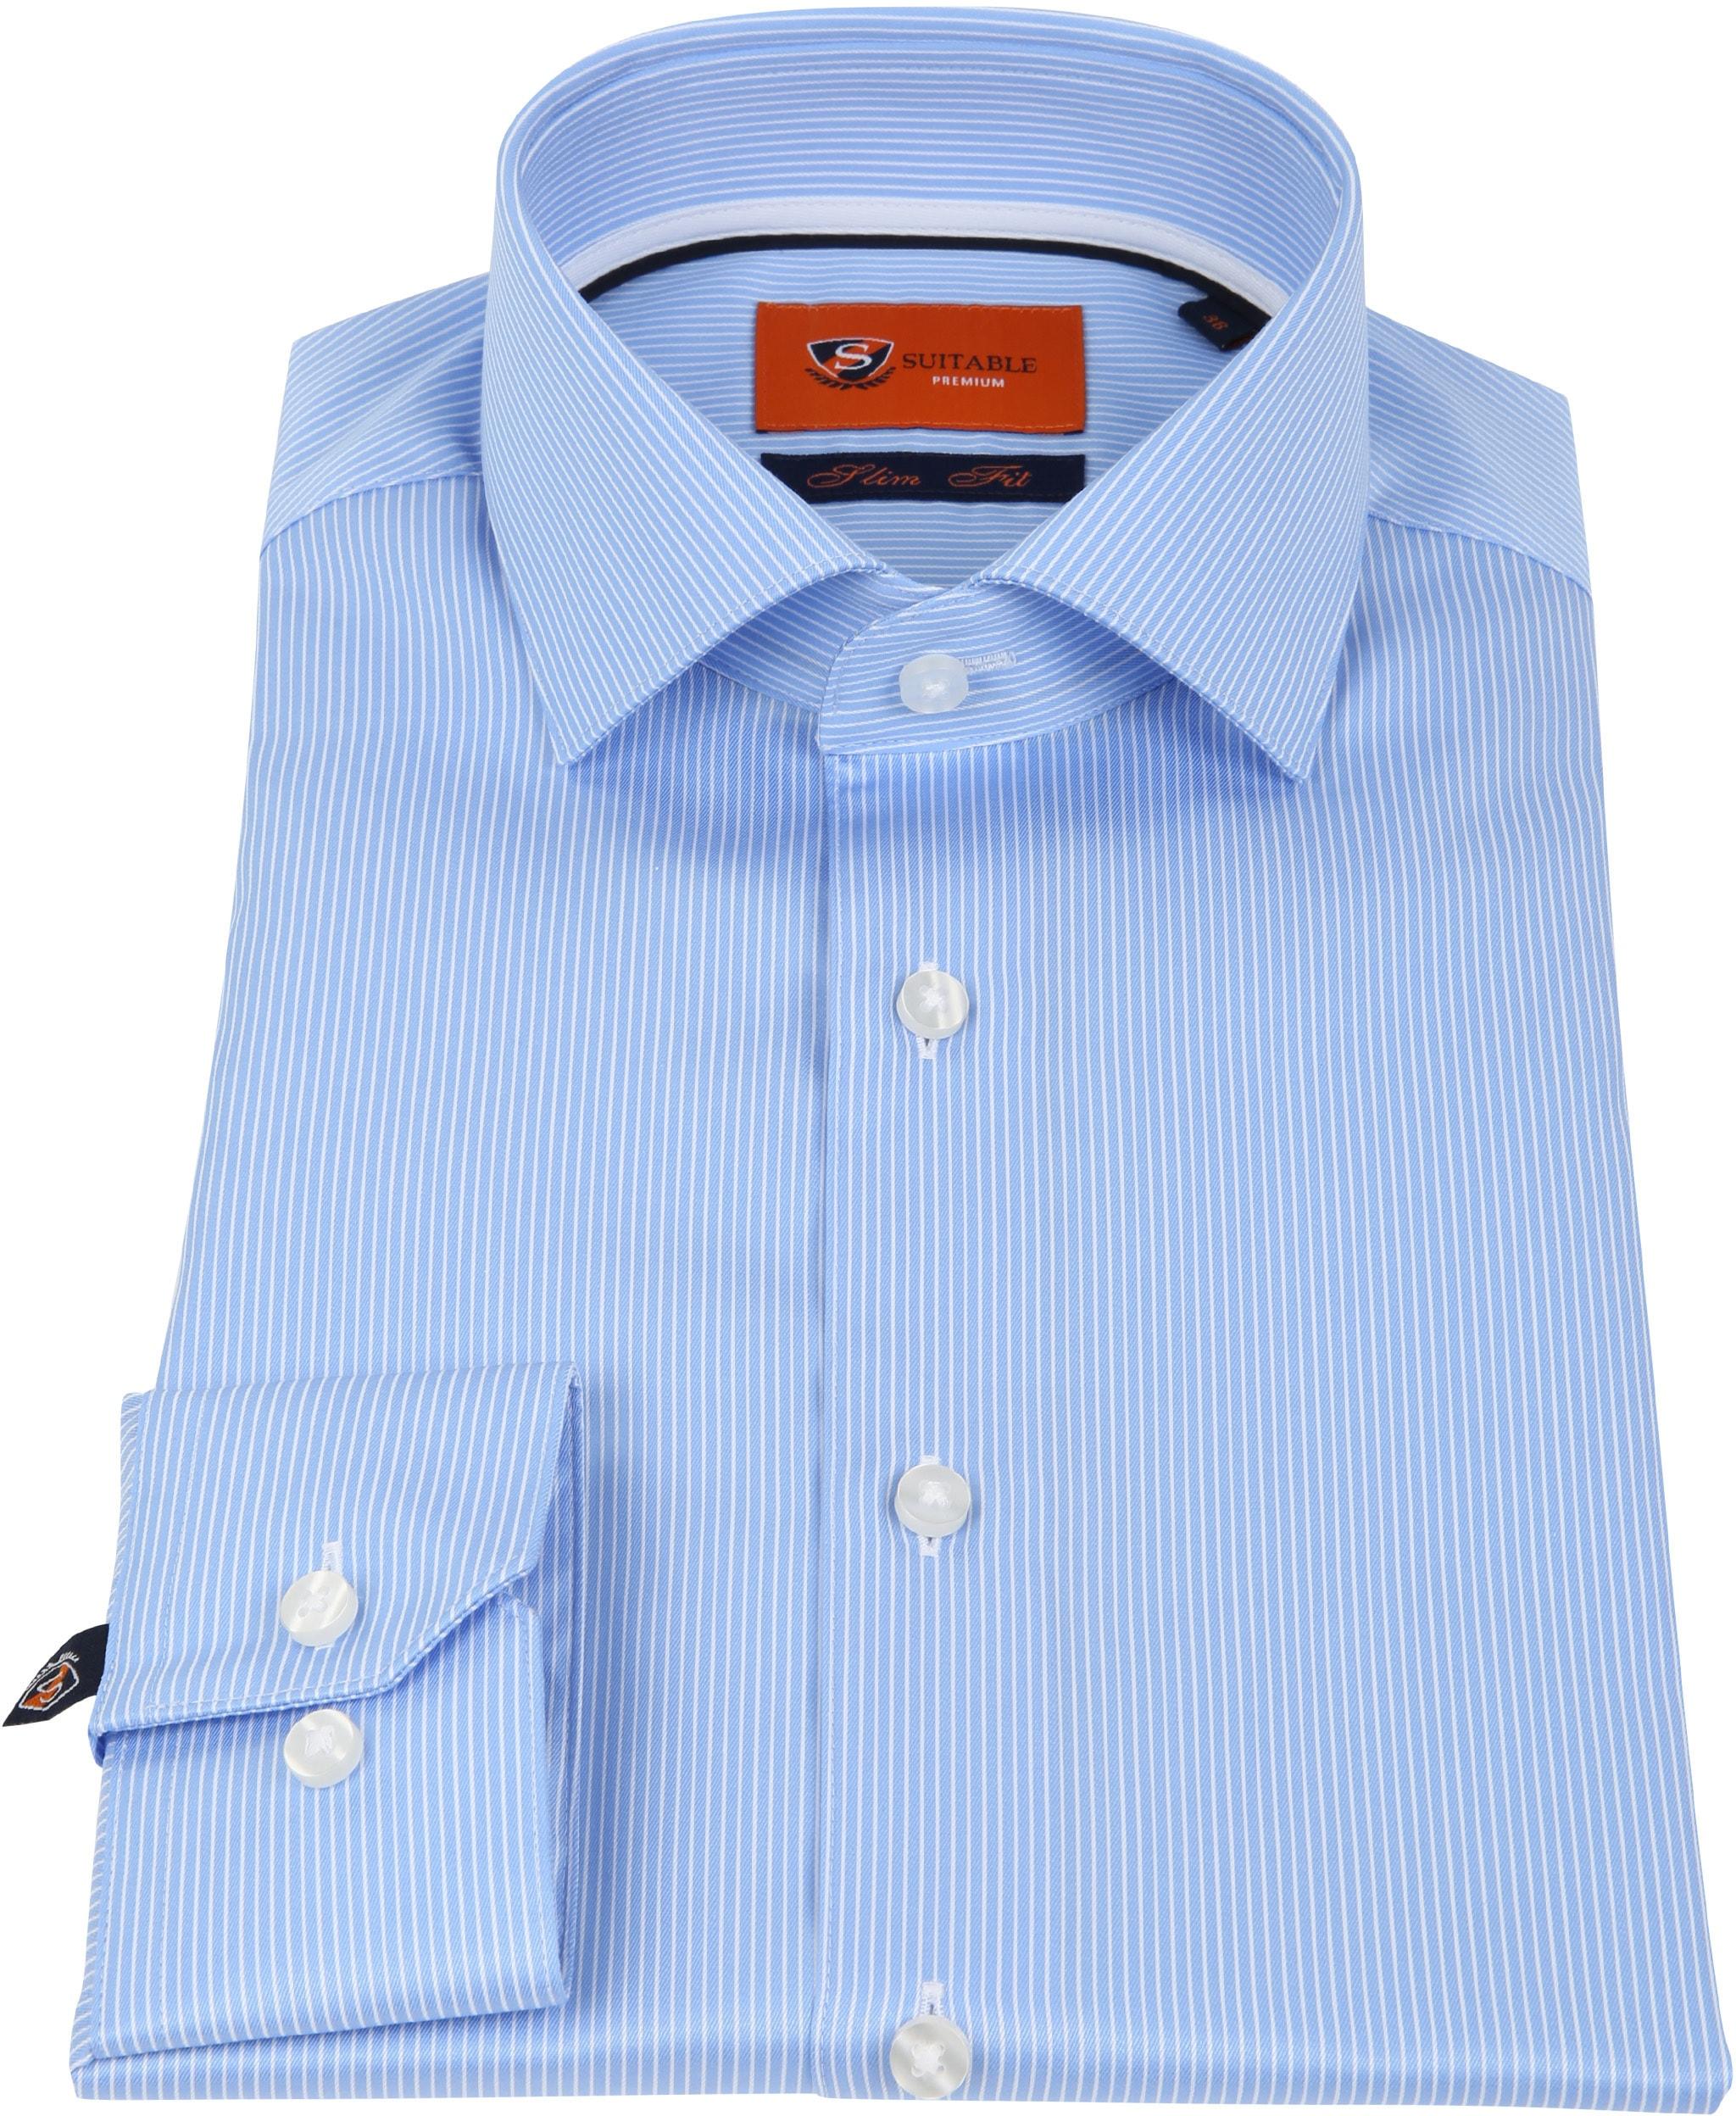 Suitable Hemd Blau Streifen D81-10 foto 2